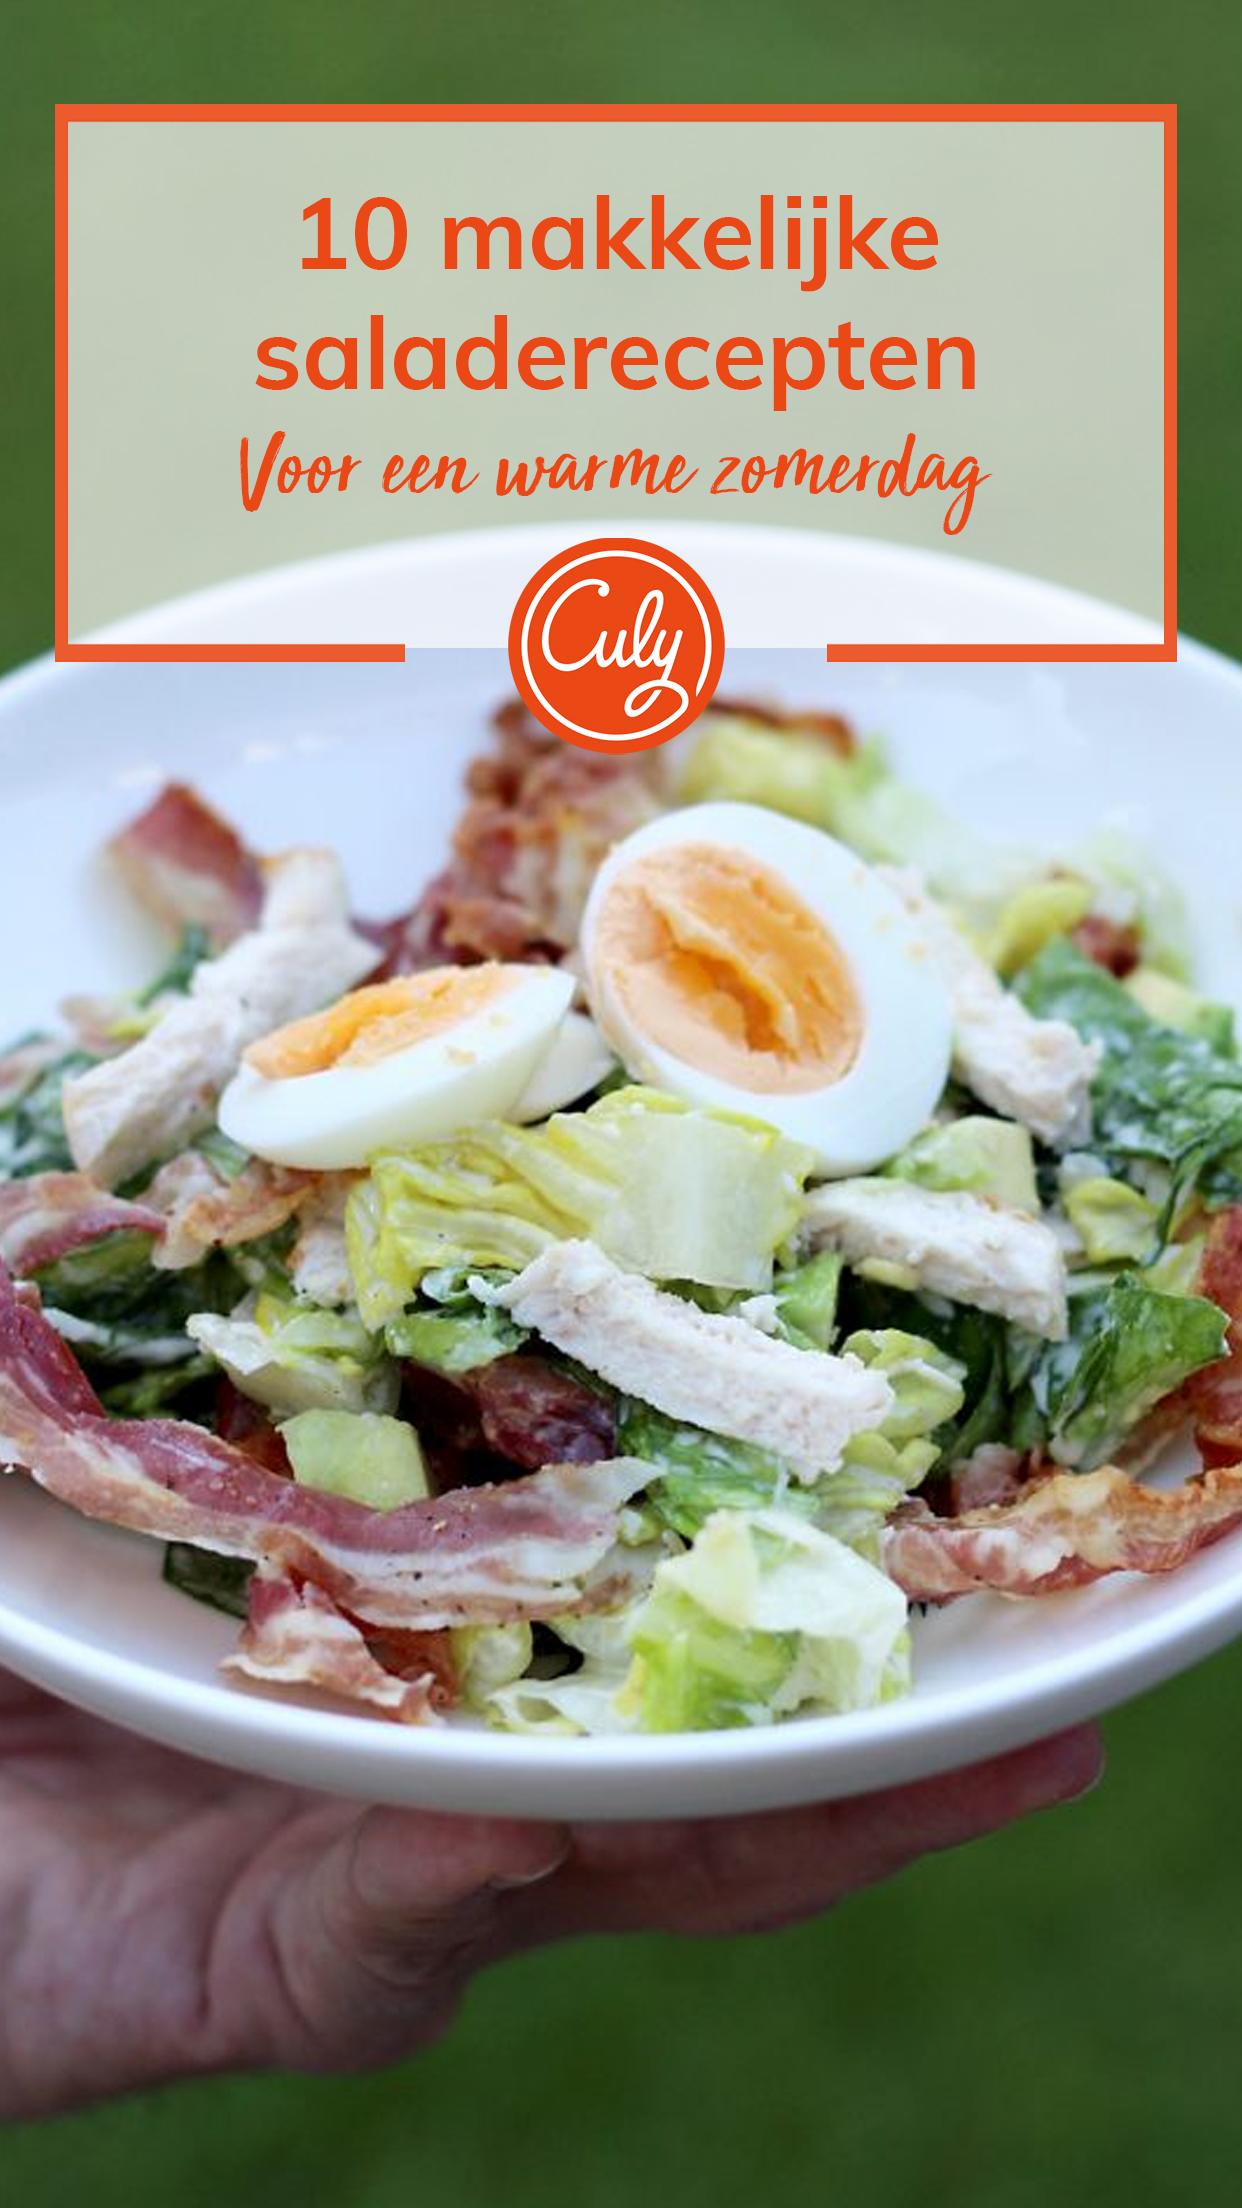 makkelijke salade caprese recept